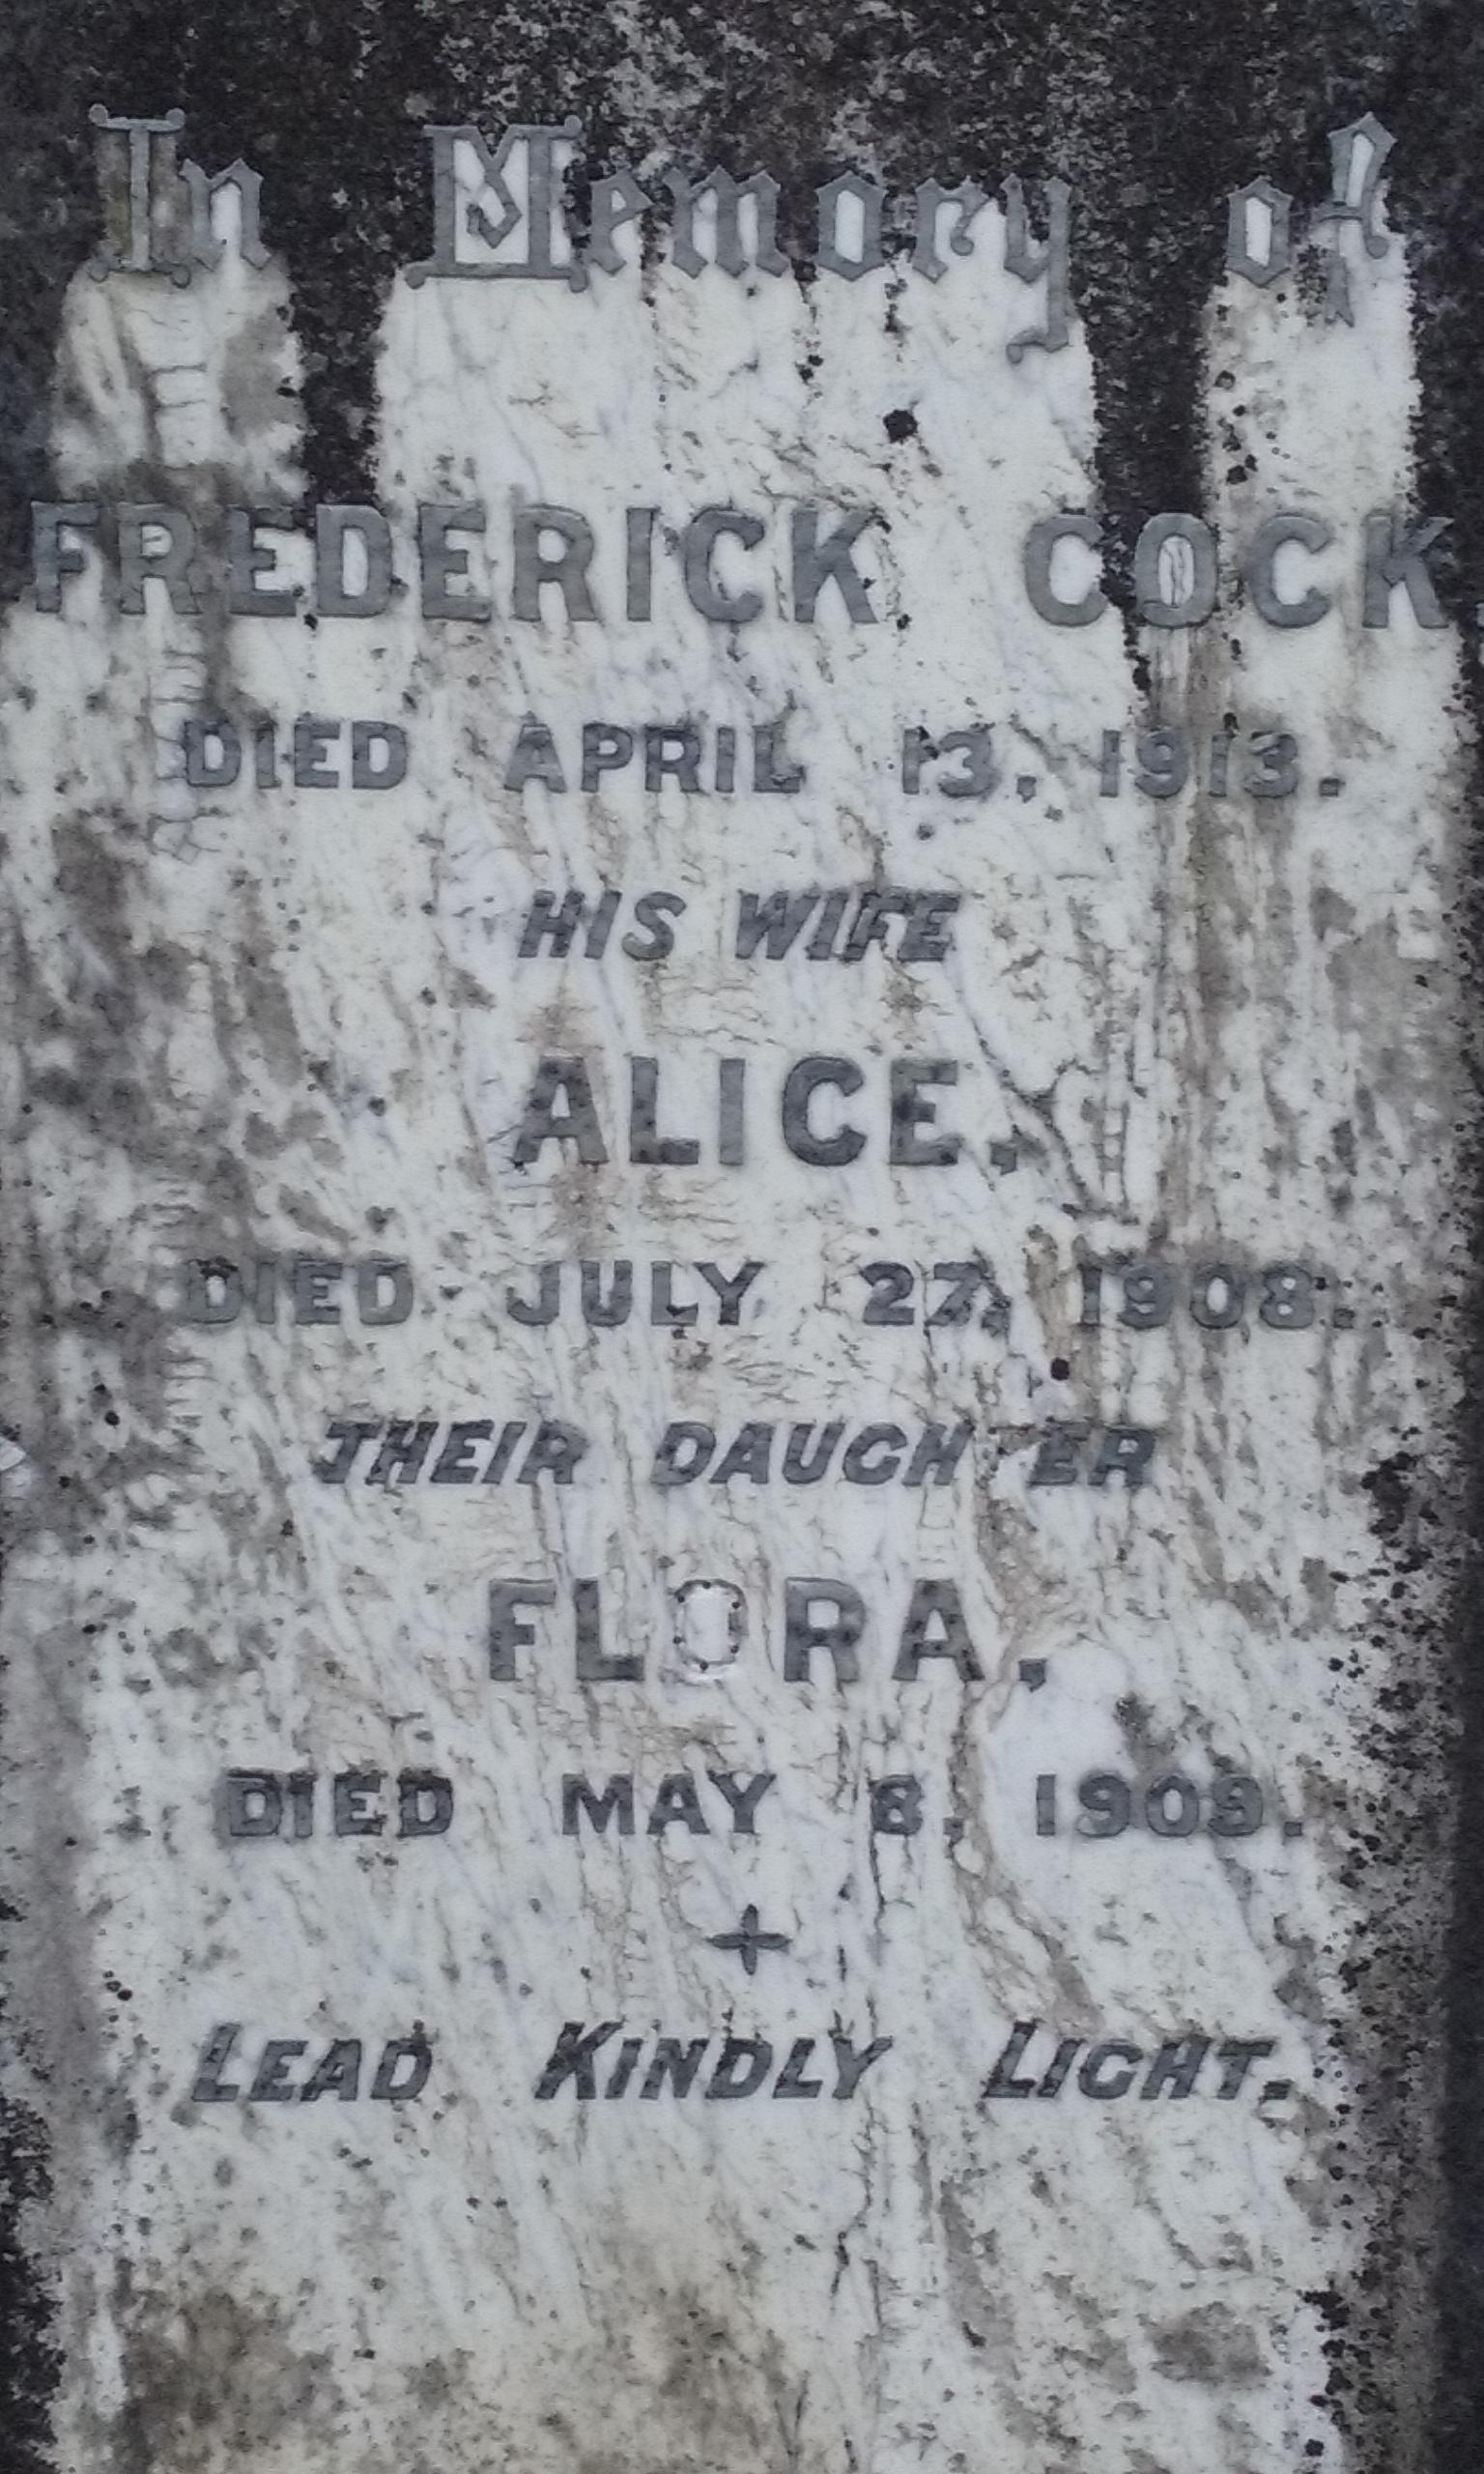 Frederick Cock